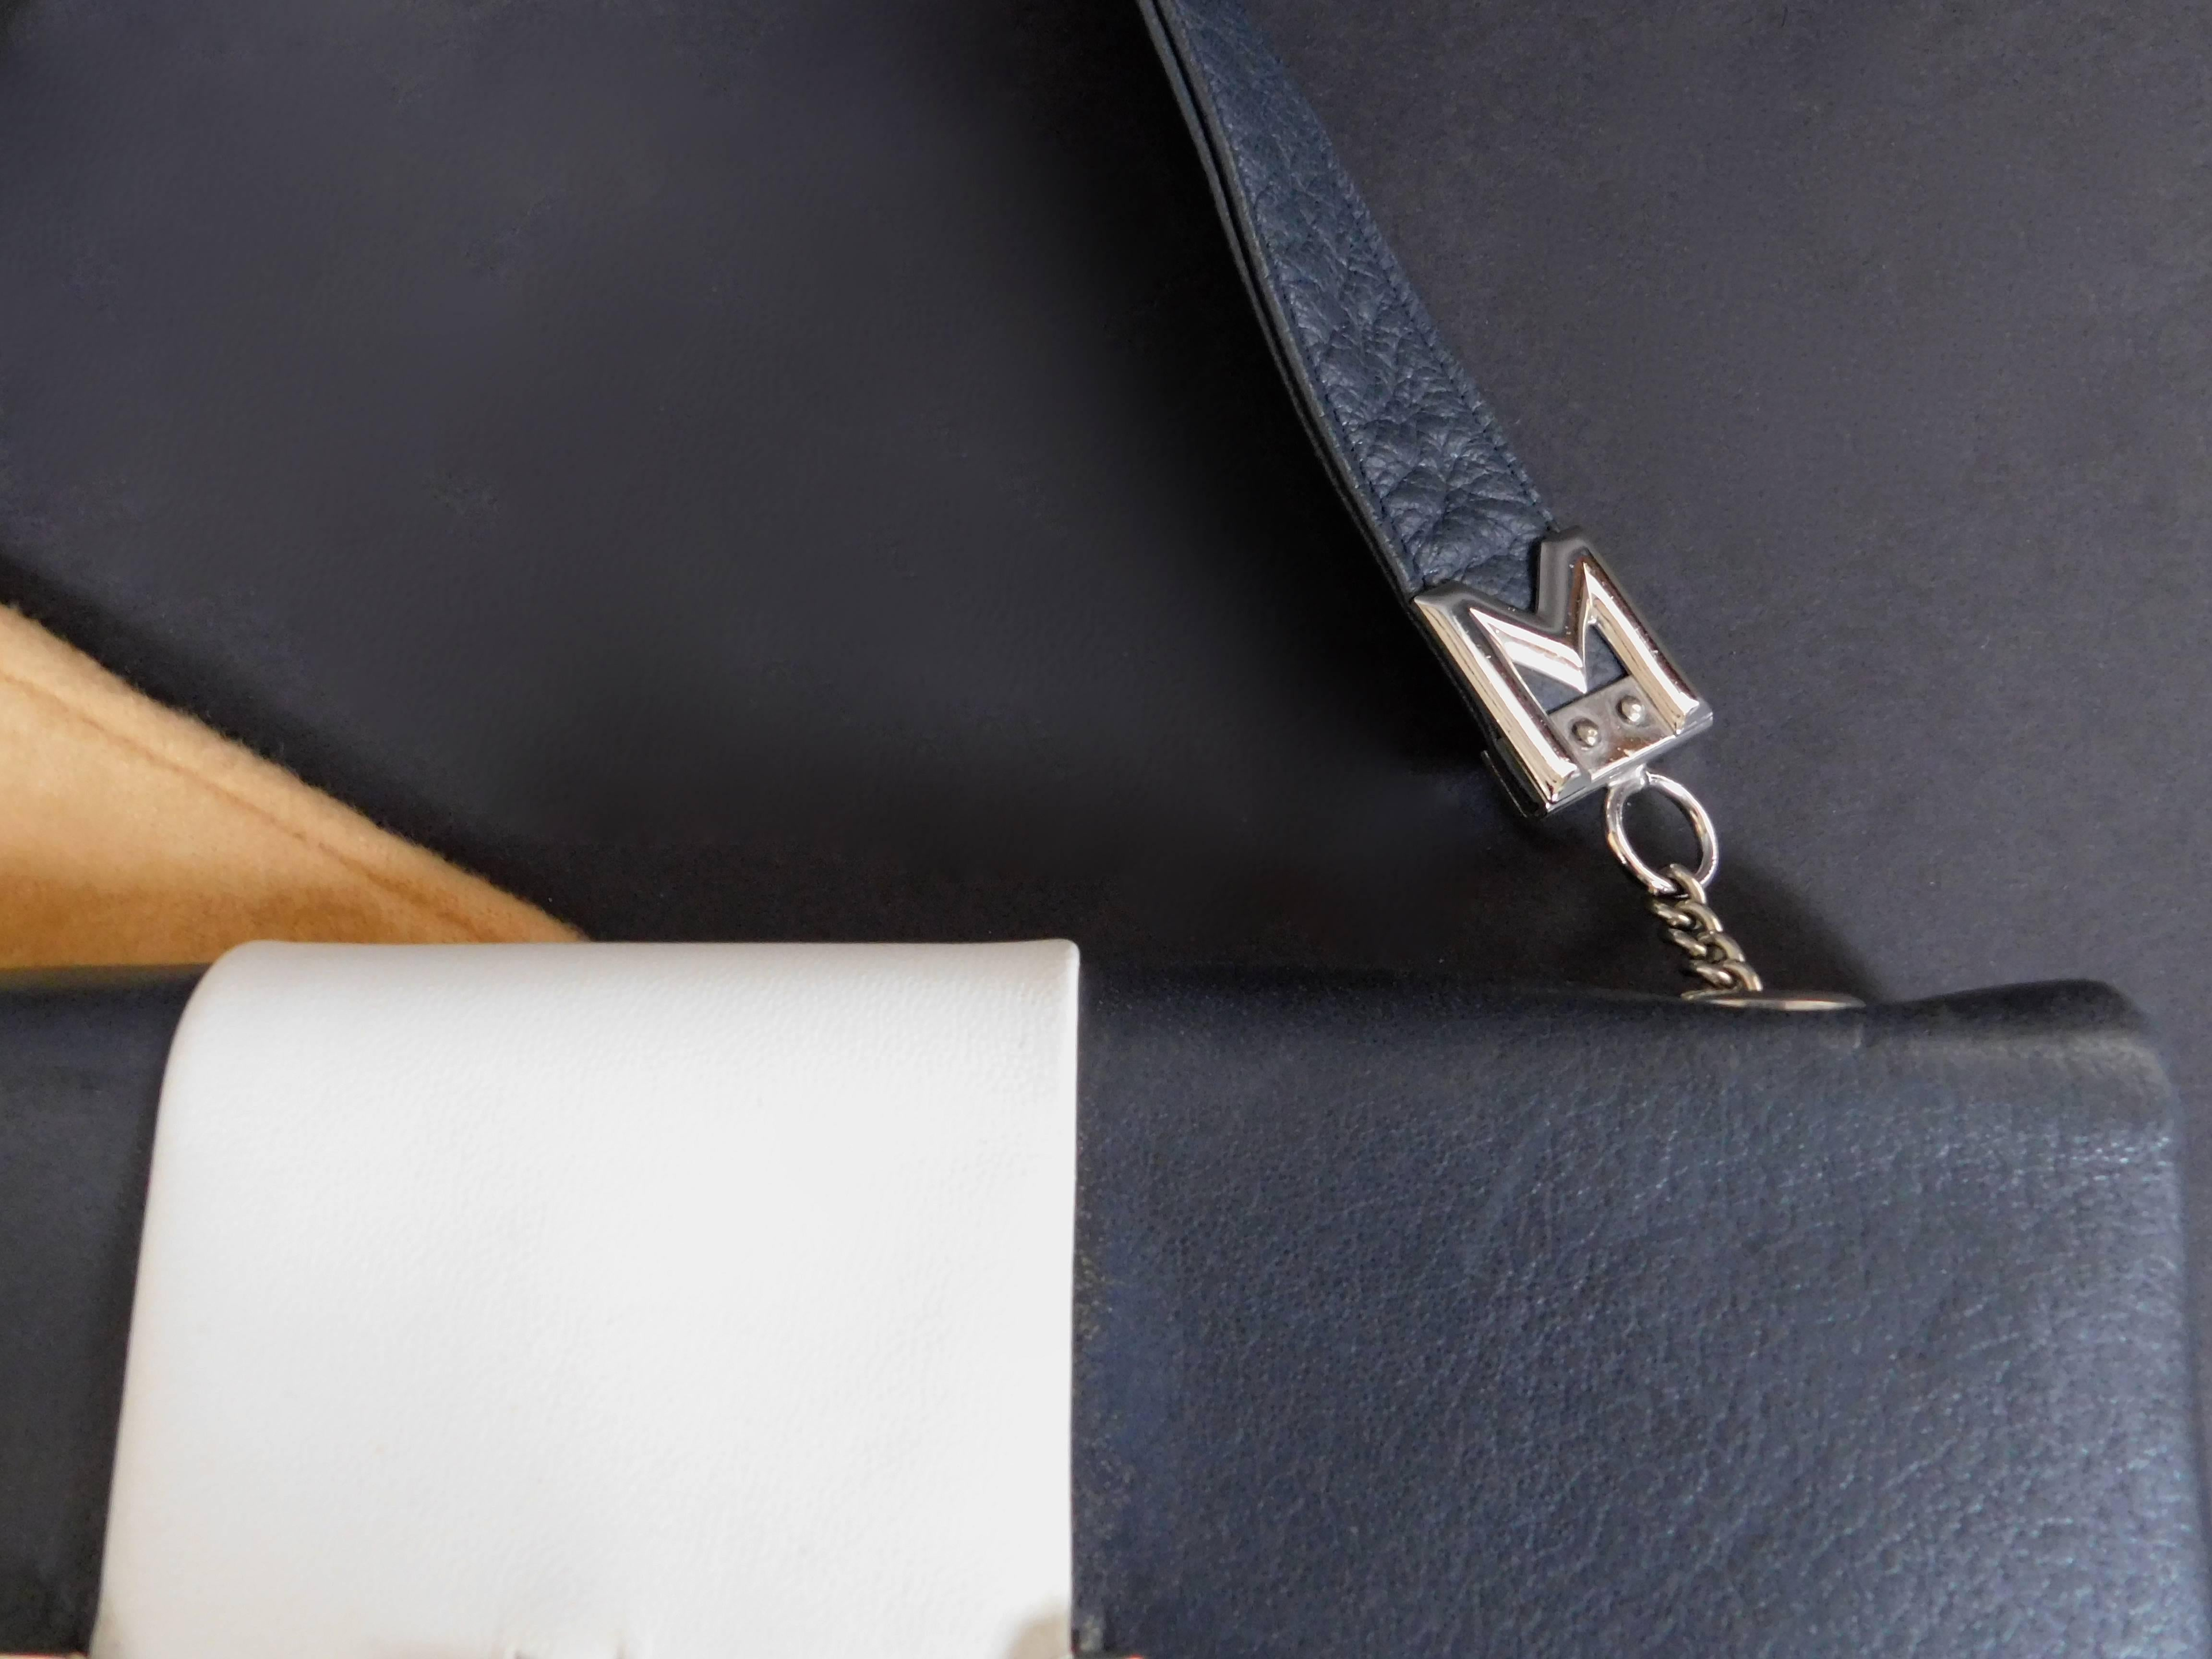 7c4a0671e Mangiameli Vintage Italian Navy Blue and White Calfskin Leather Handbag For  Sale at 1stdibs